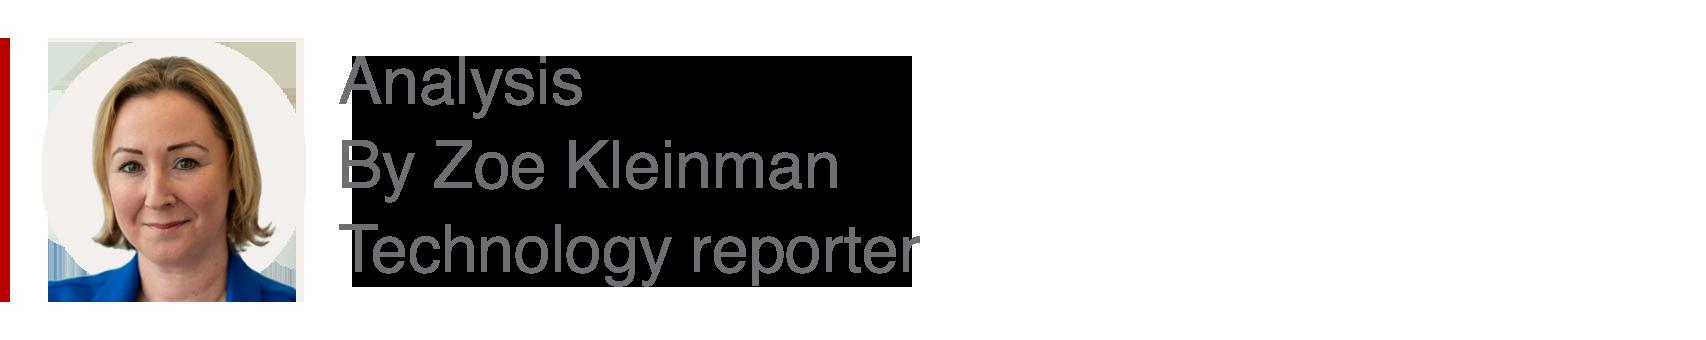 Analysis box by Zoe Kleinman, technology reporter